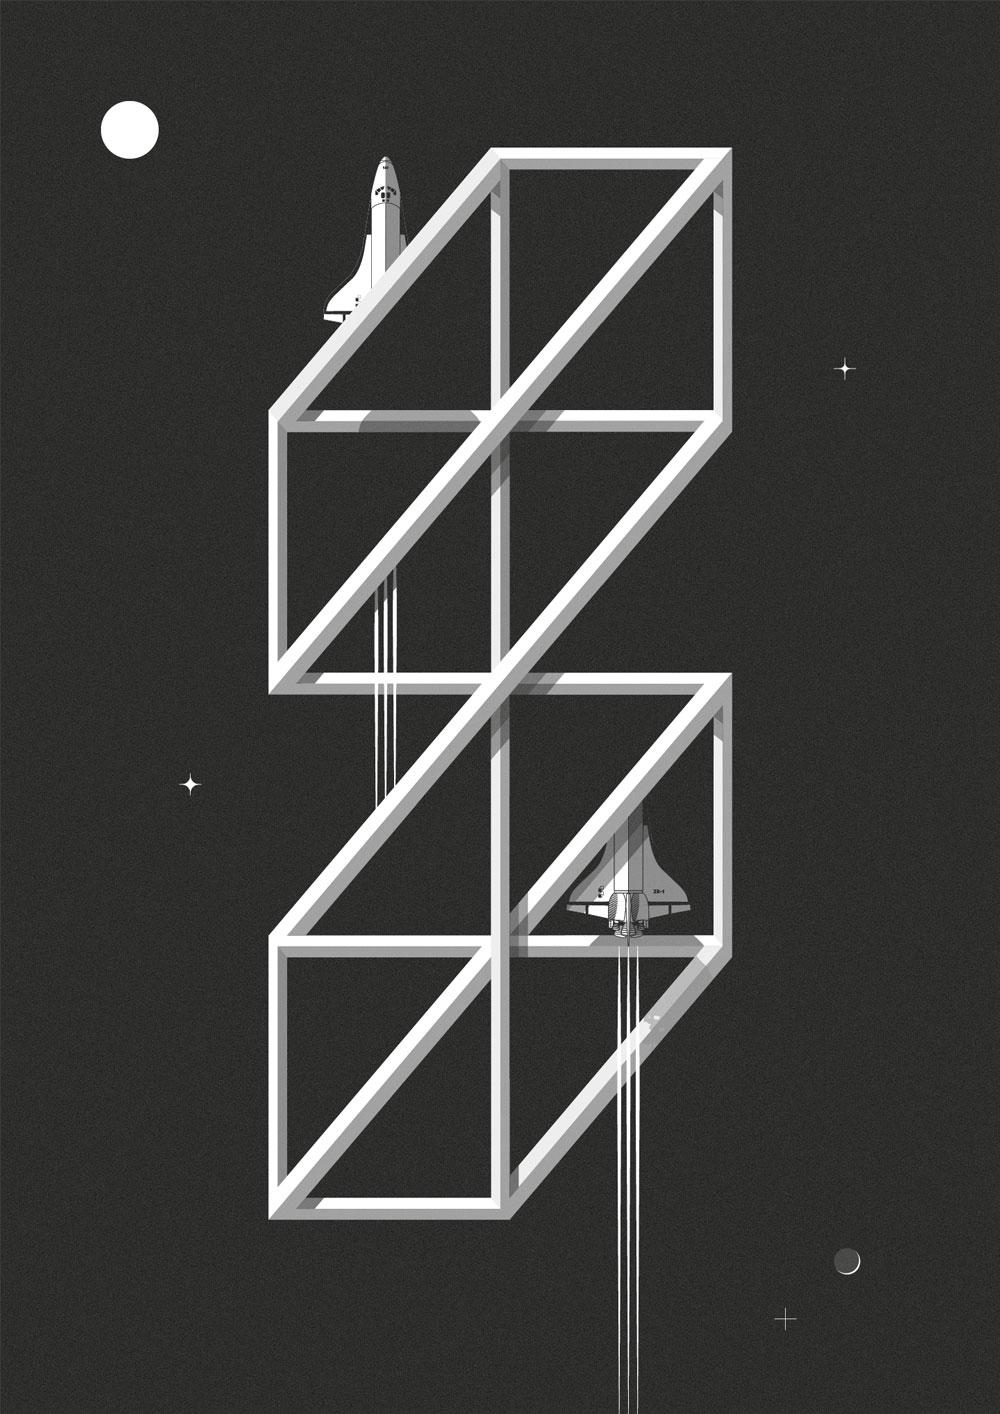 zr-space1